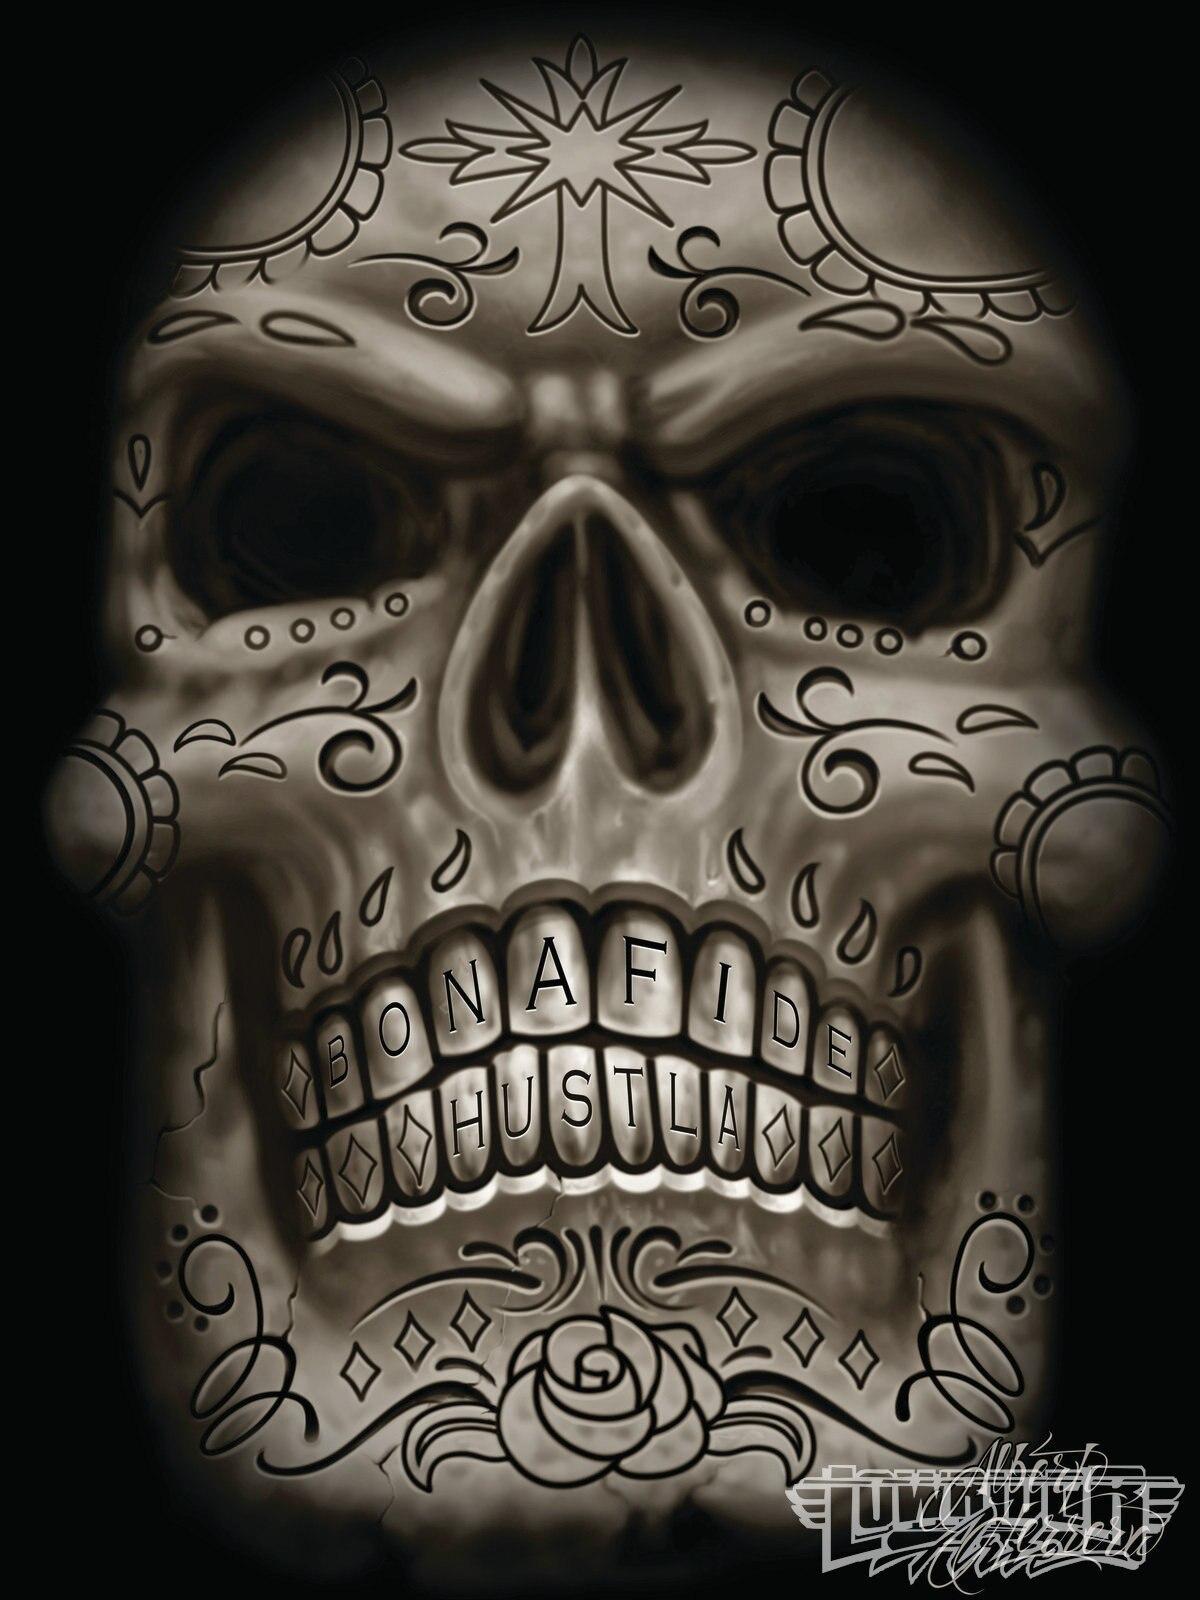 Lowrider Arte Aztec Drawings Lowrider Arte Wallpaper – Wallpapers Browse